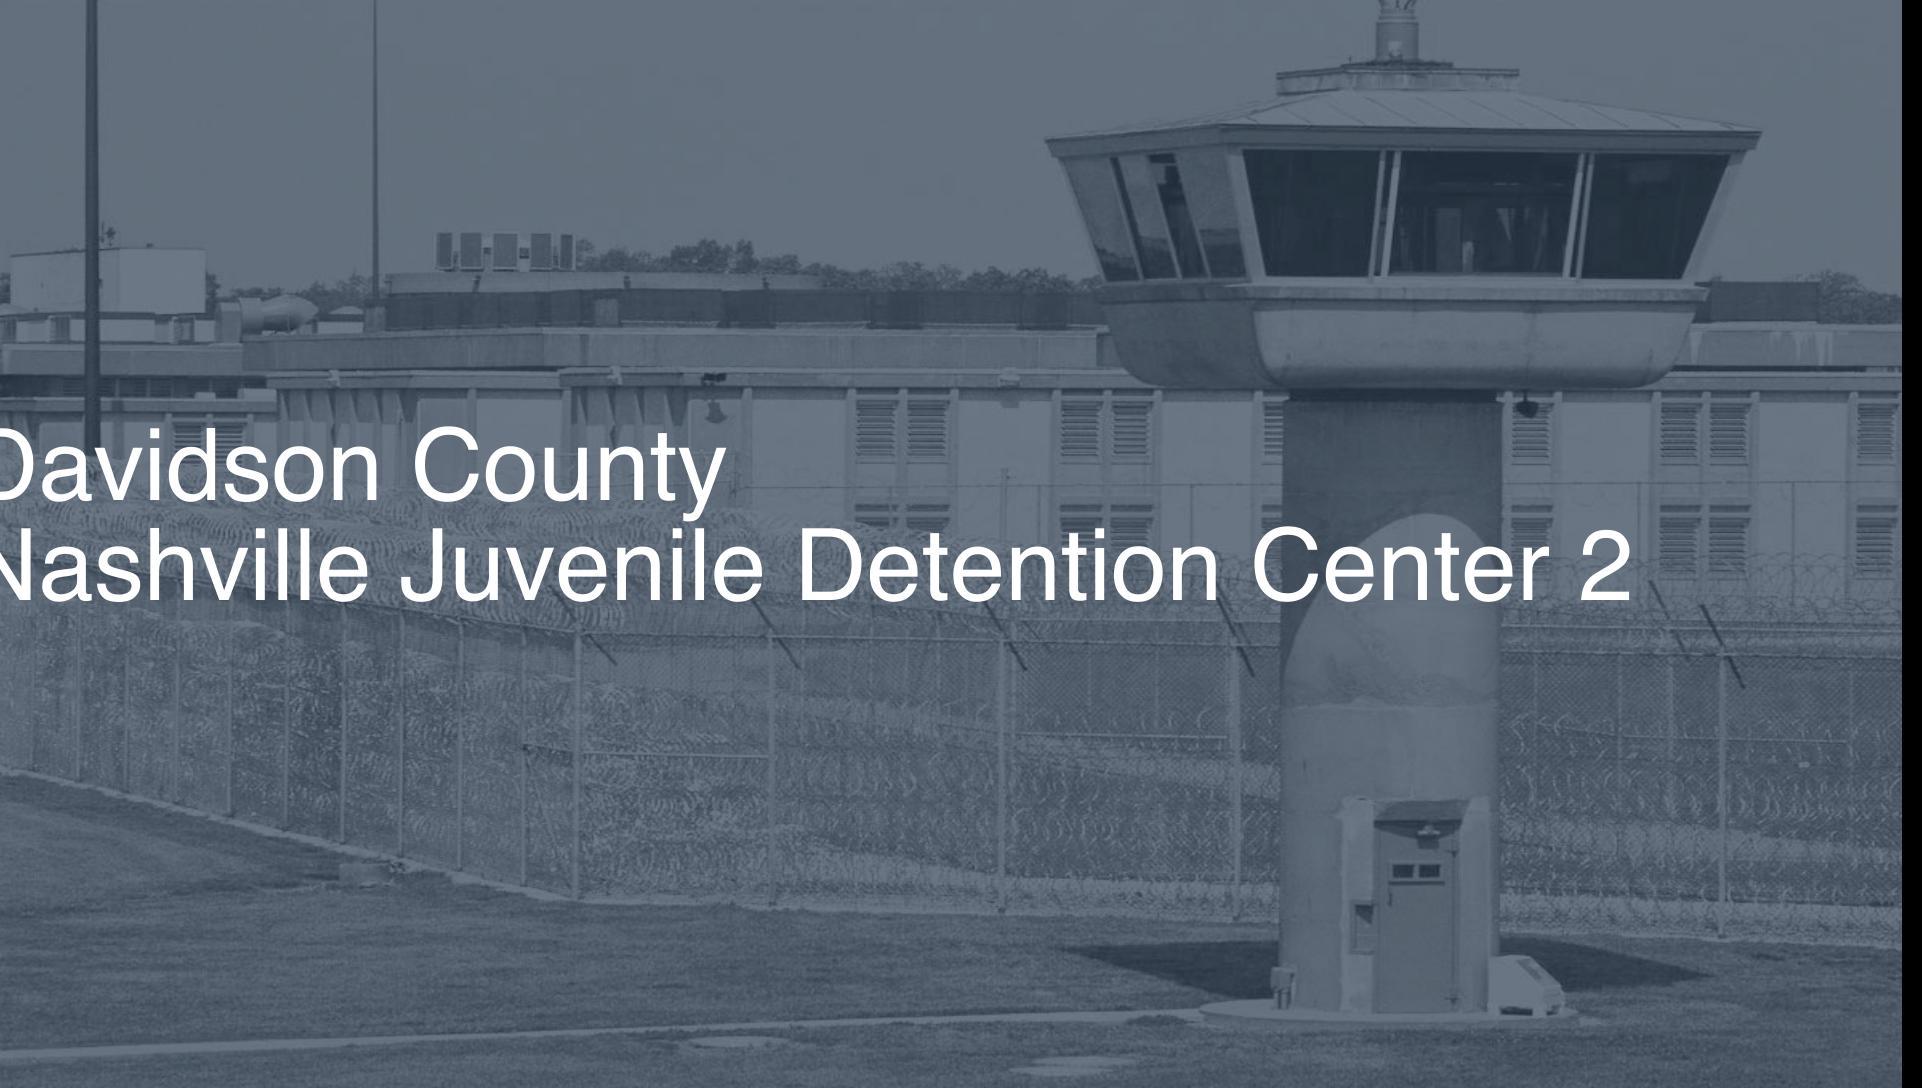 Davidson County (Nashville) Juvenile Detention Center (2019